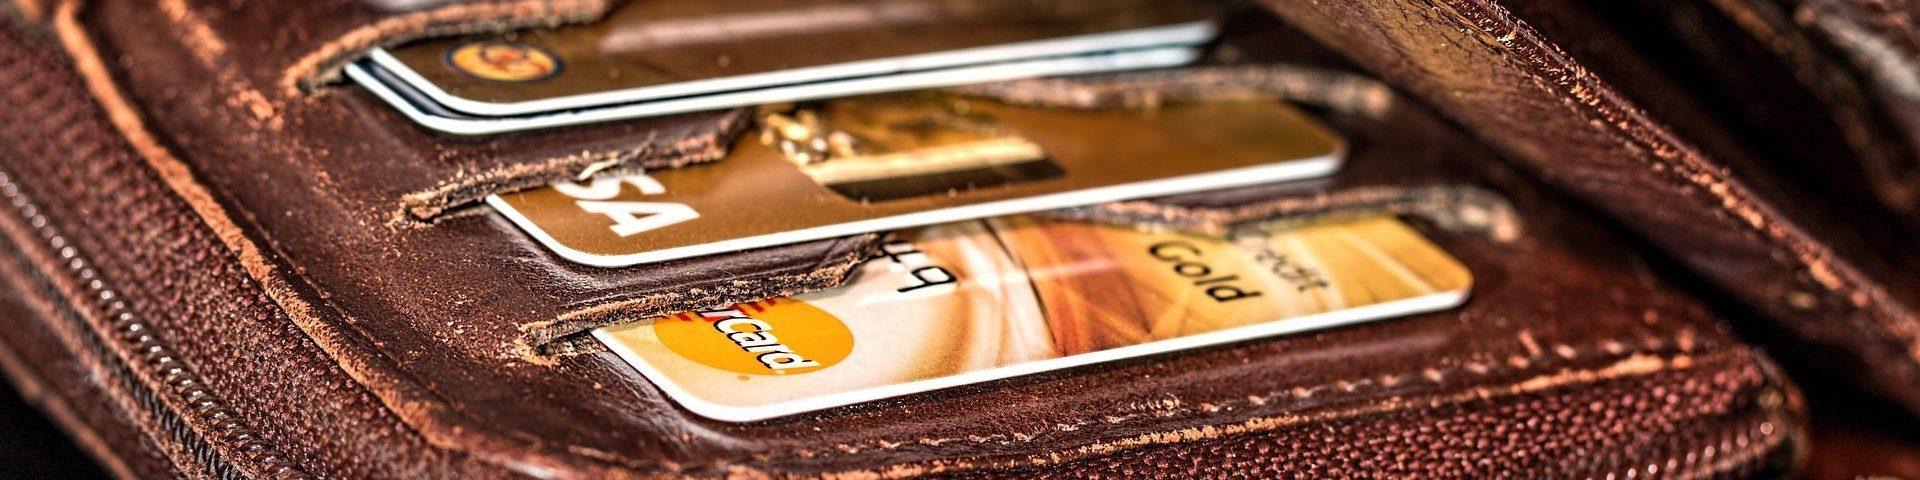 Wallet 908569 1920